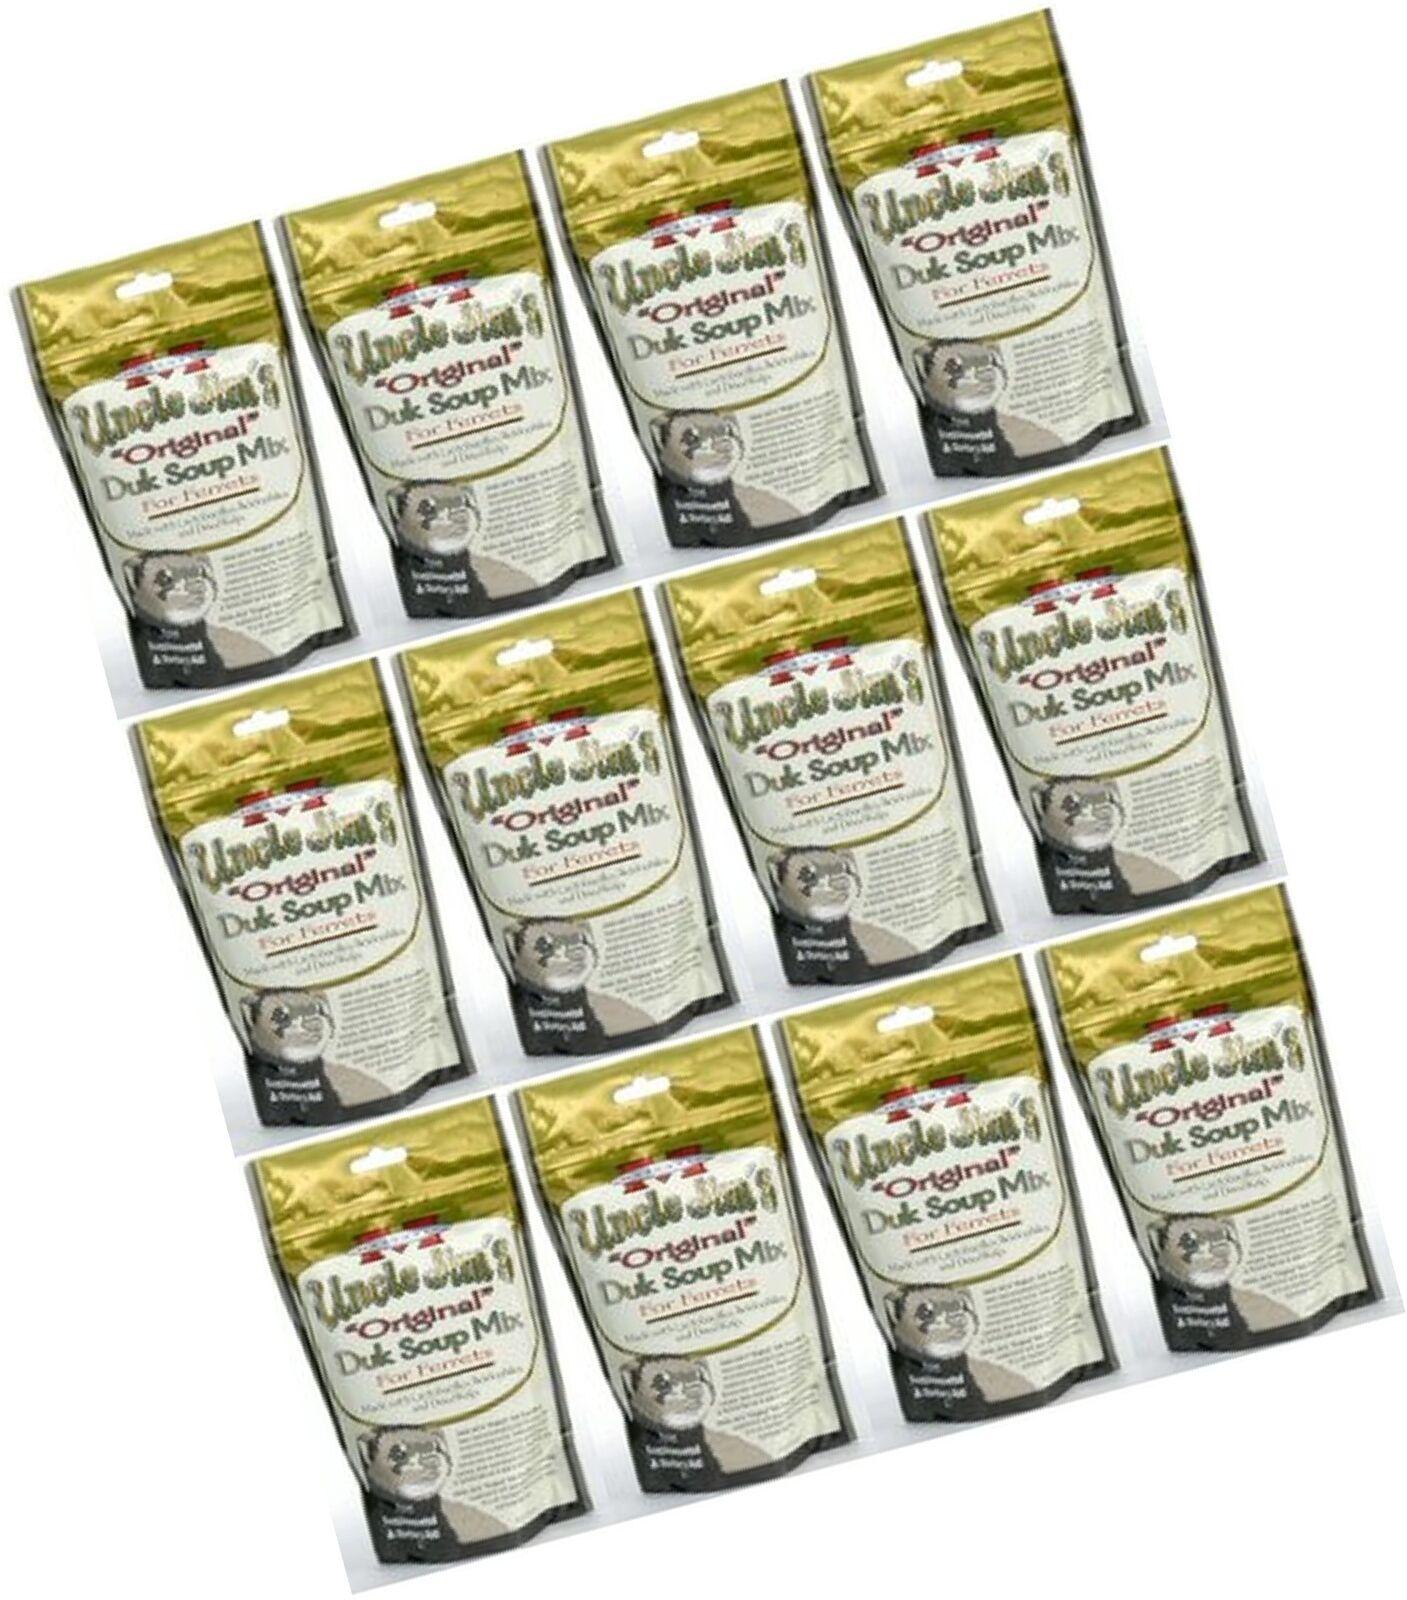 Marshall Uncle Jim's Original Duk Soup Mix for Ferrets 3.375Lb (12 x 4.5oz)